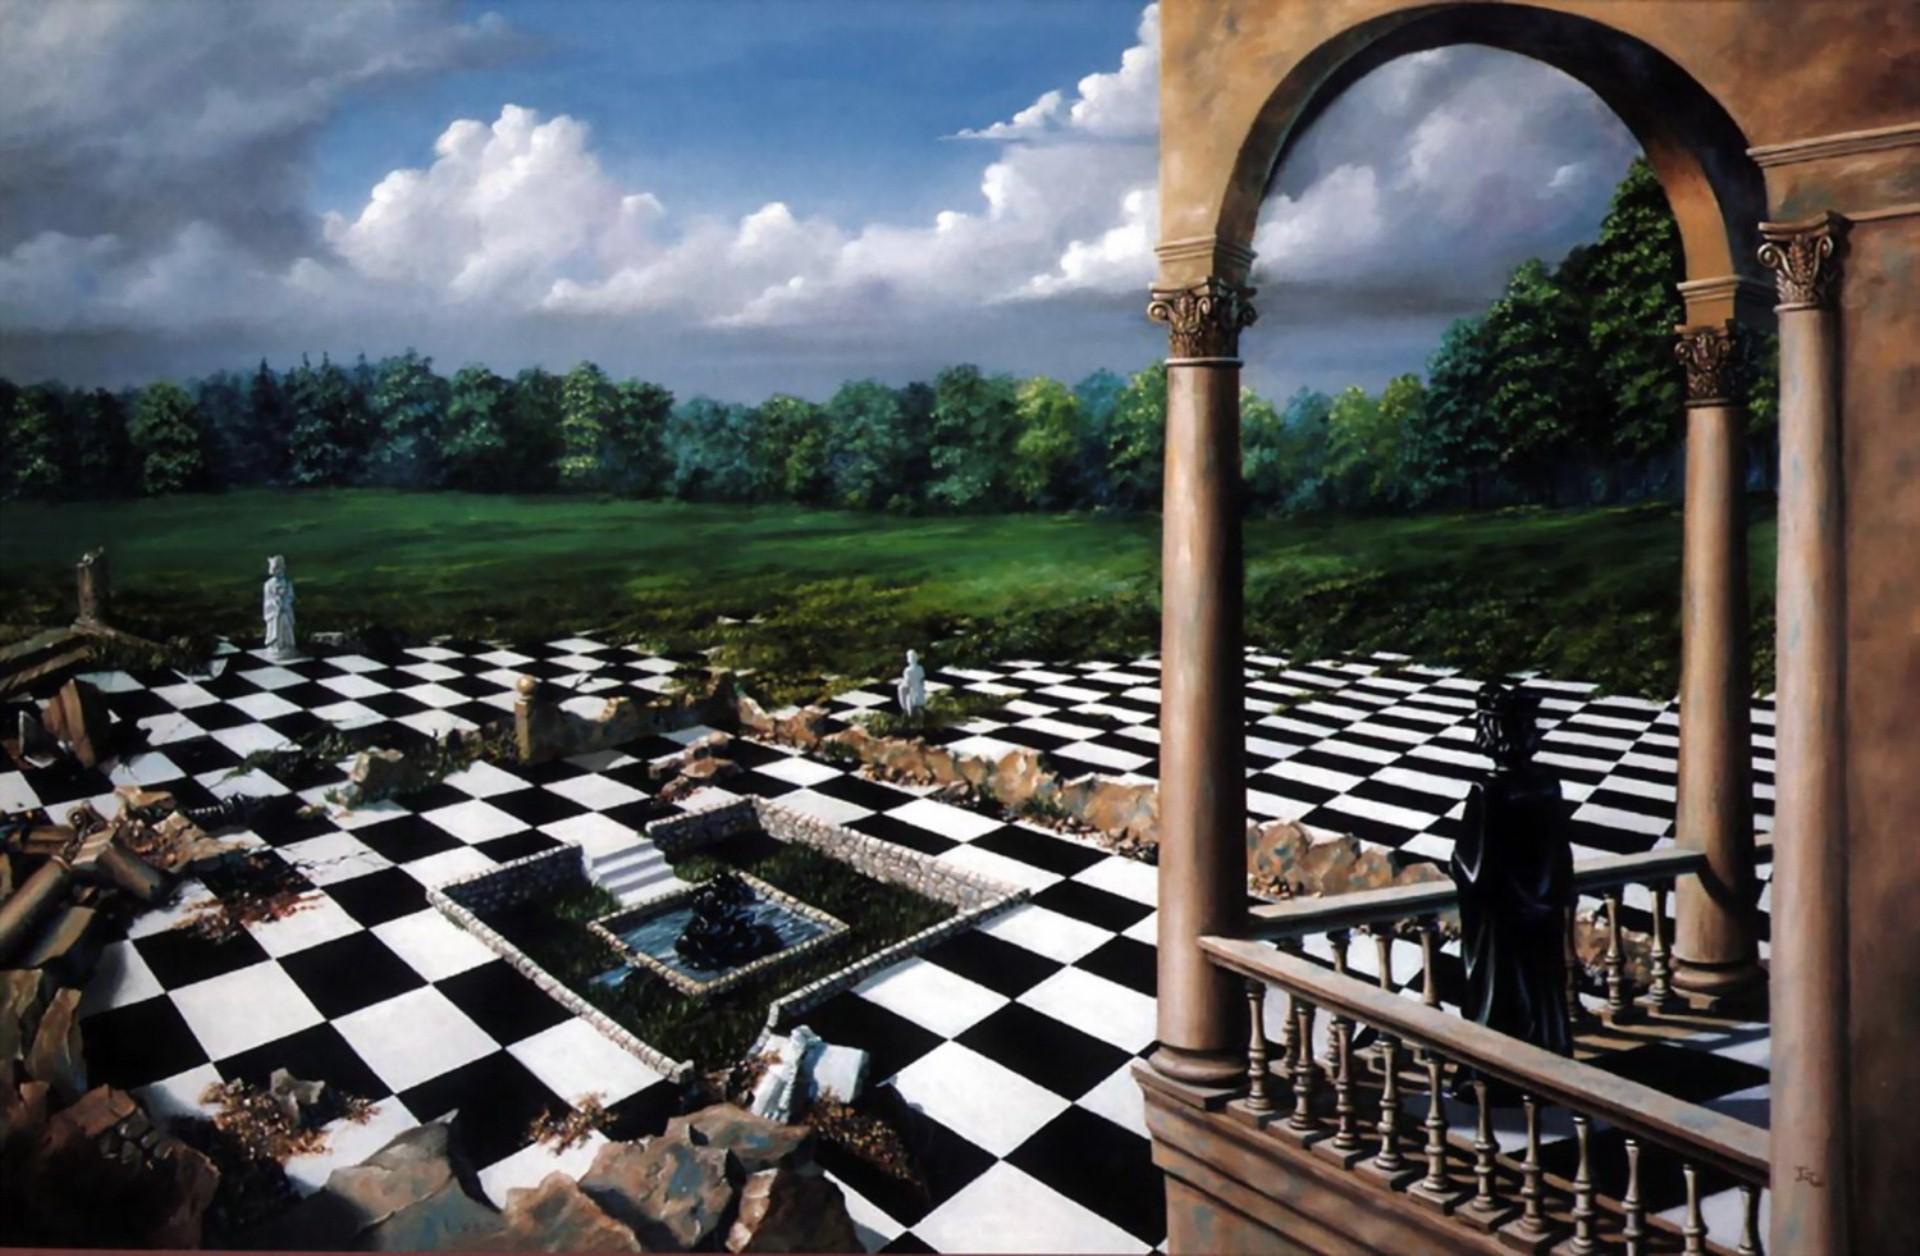 шахматен старгейт портал